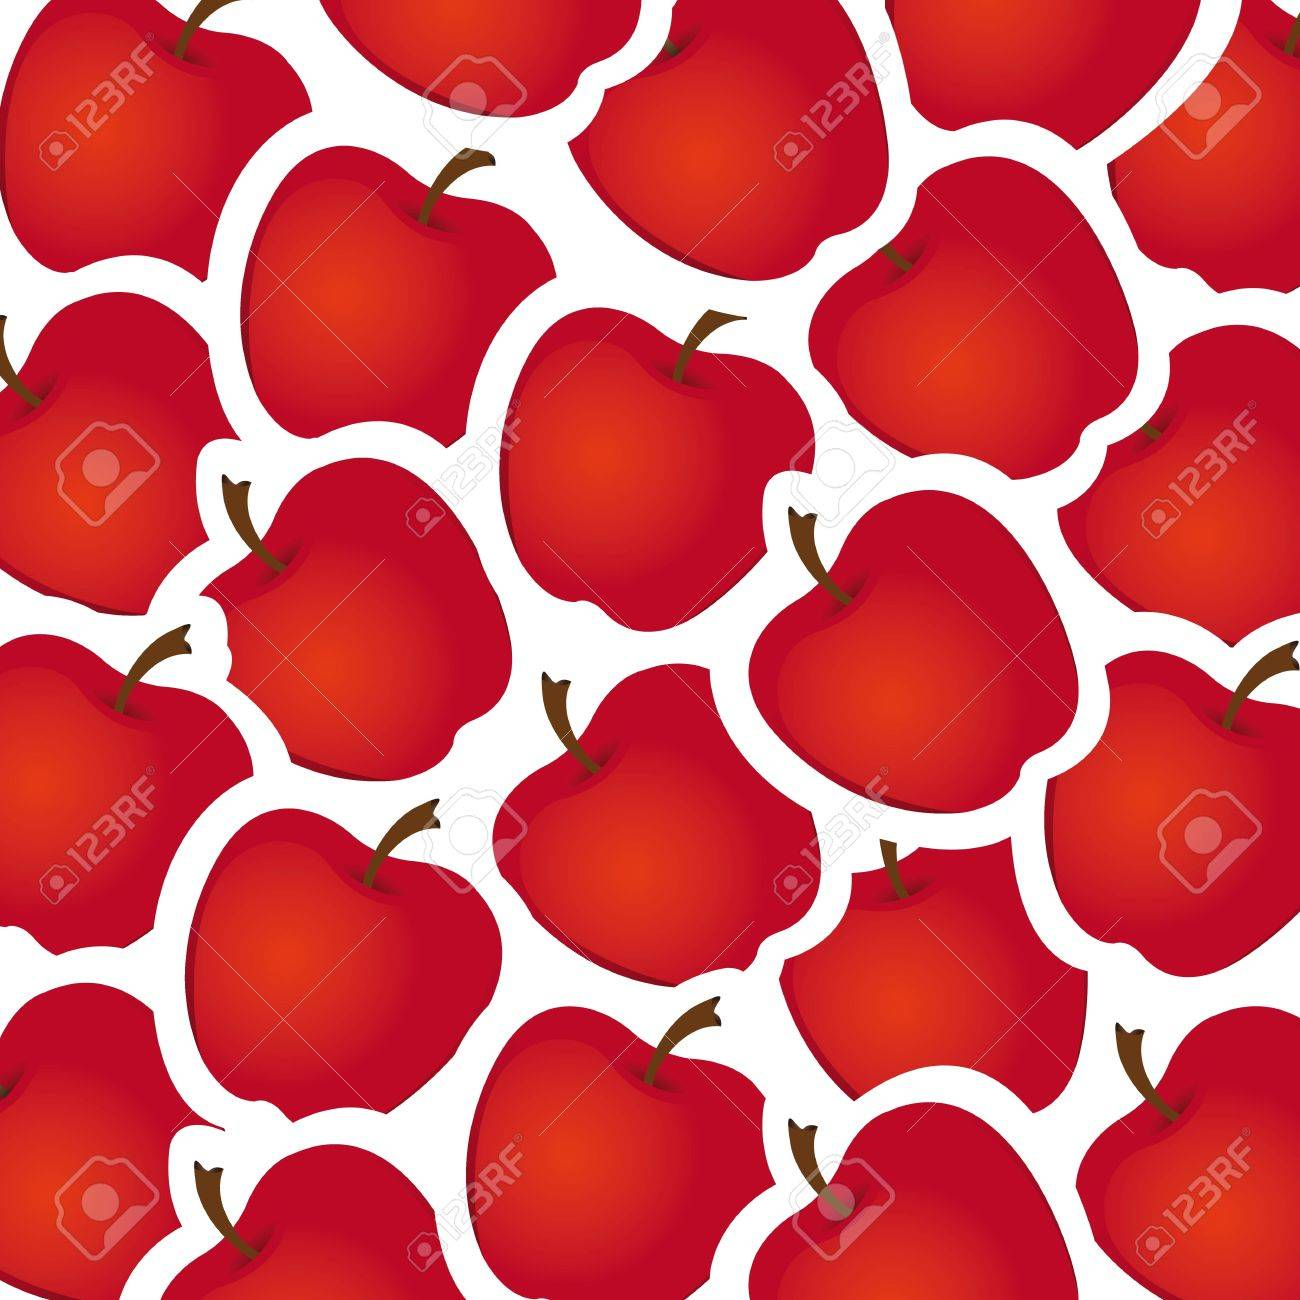 apple stickers pattern, illustration Stock Vector - 13774542